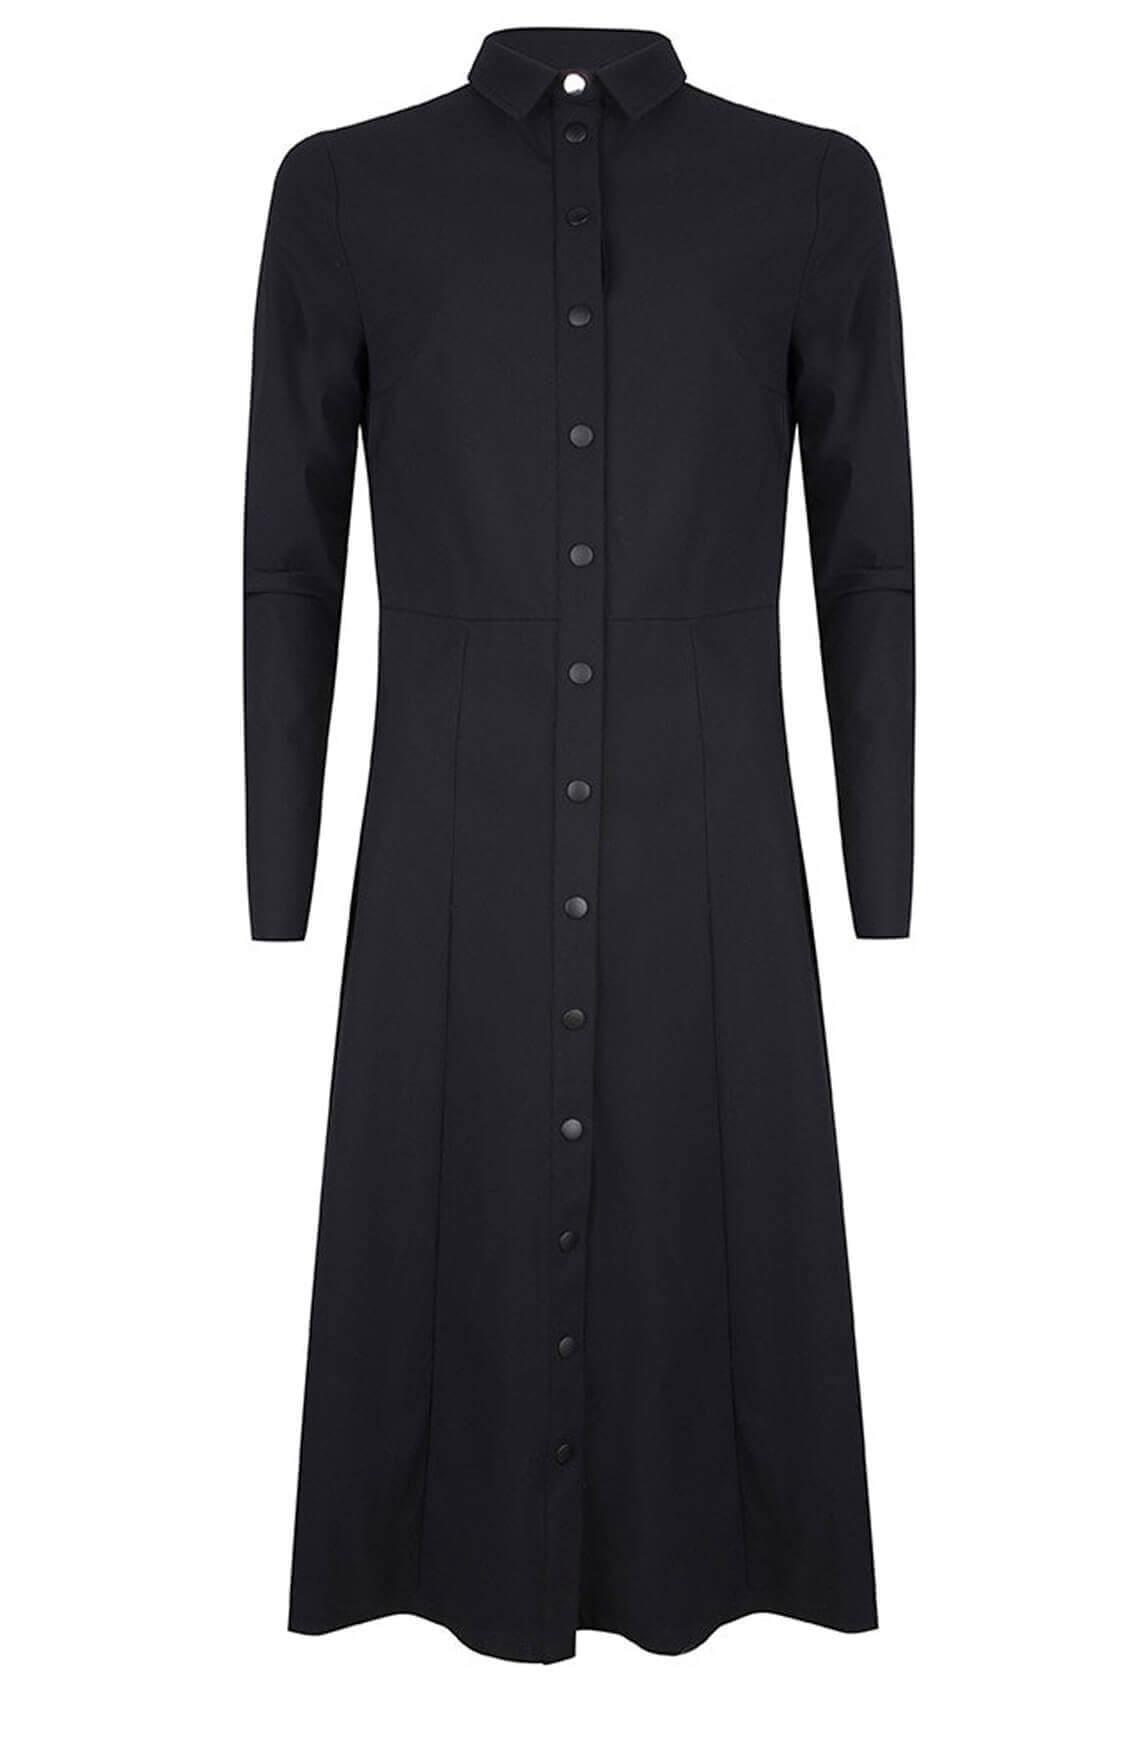 Jane Lushka Dames Jersey jurk zwart